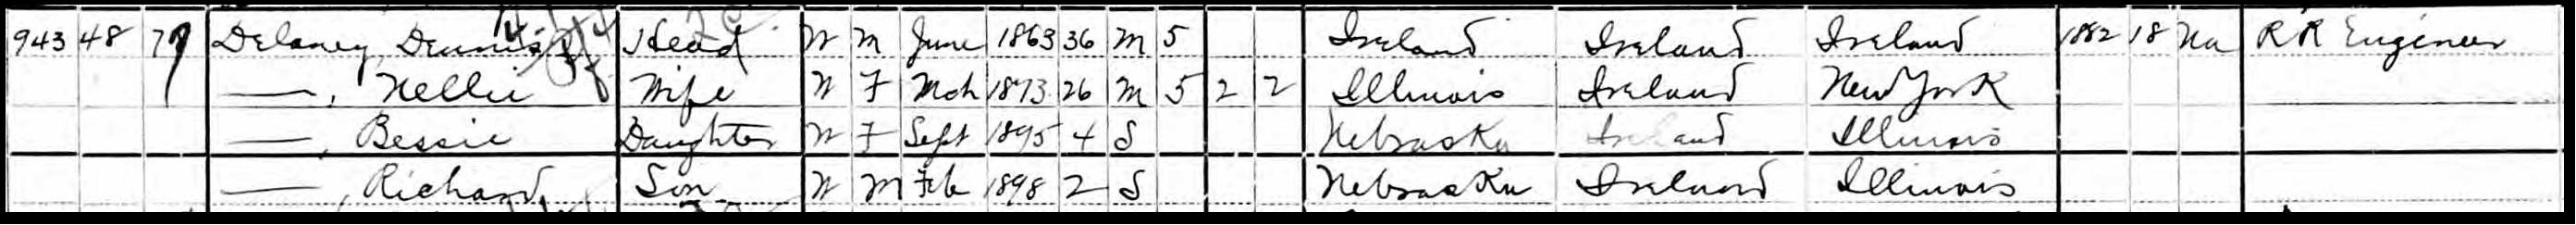 1900 US Census Dennis& Nellie Delaney